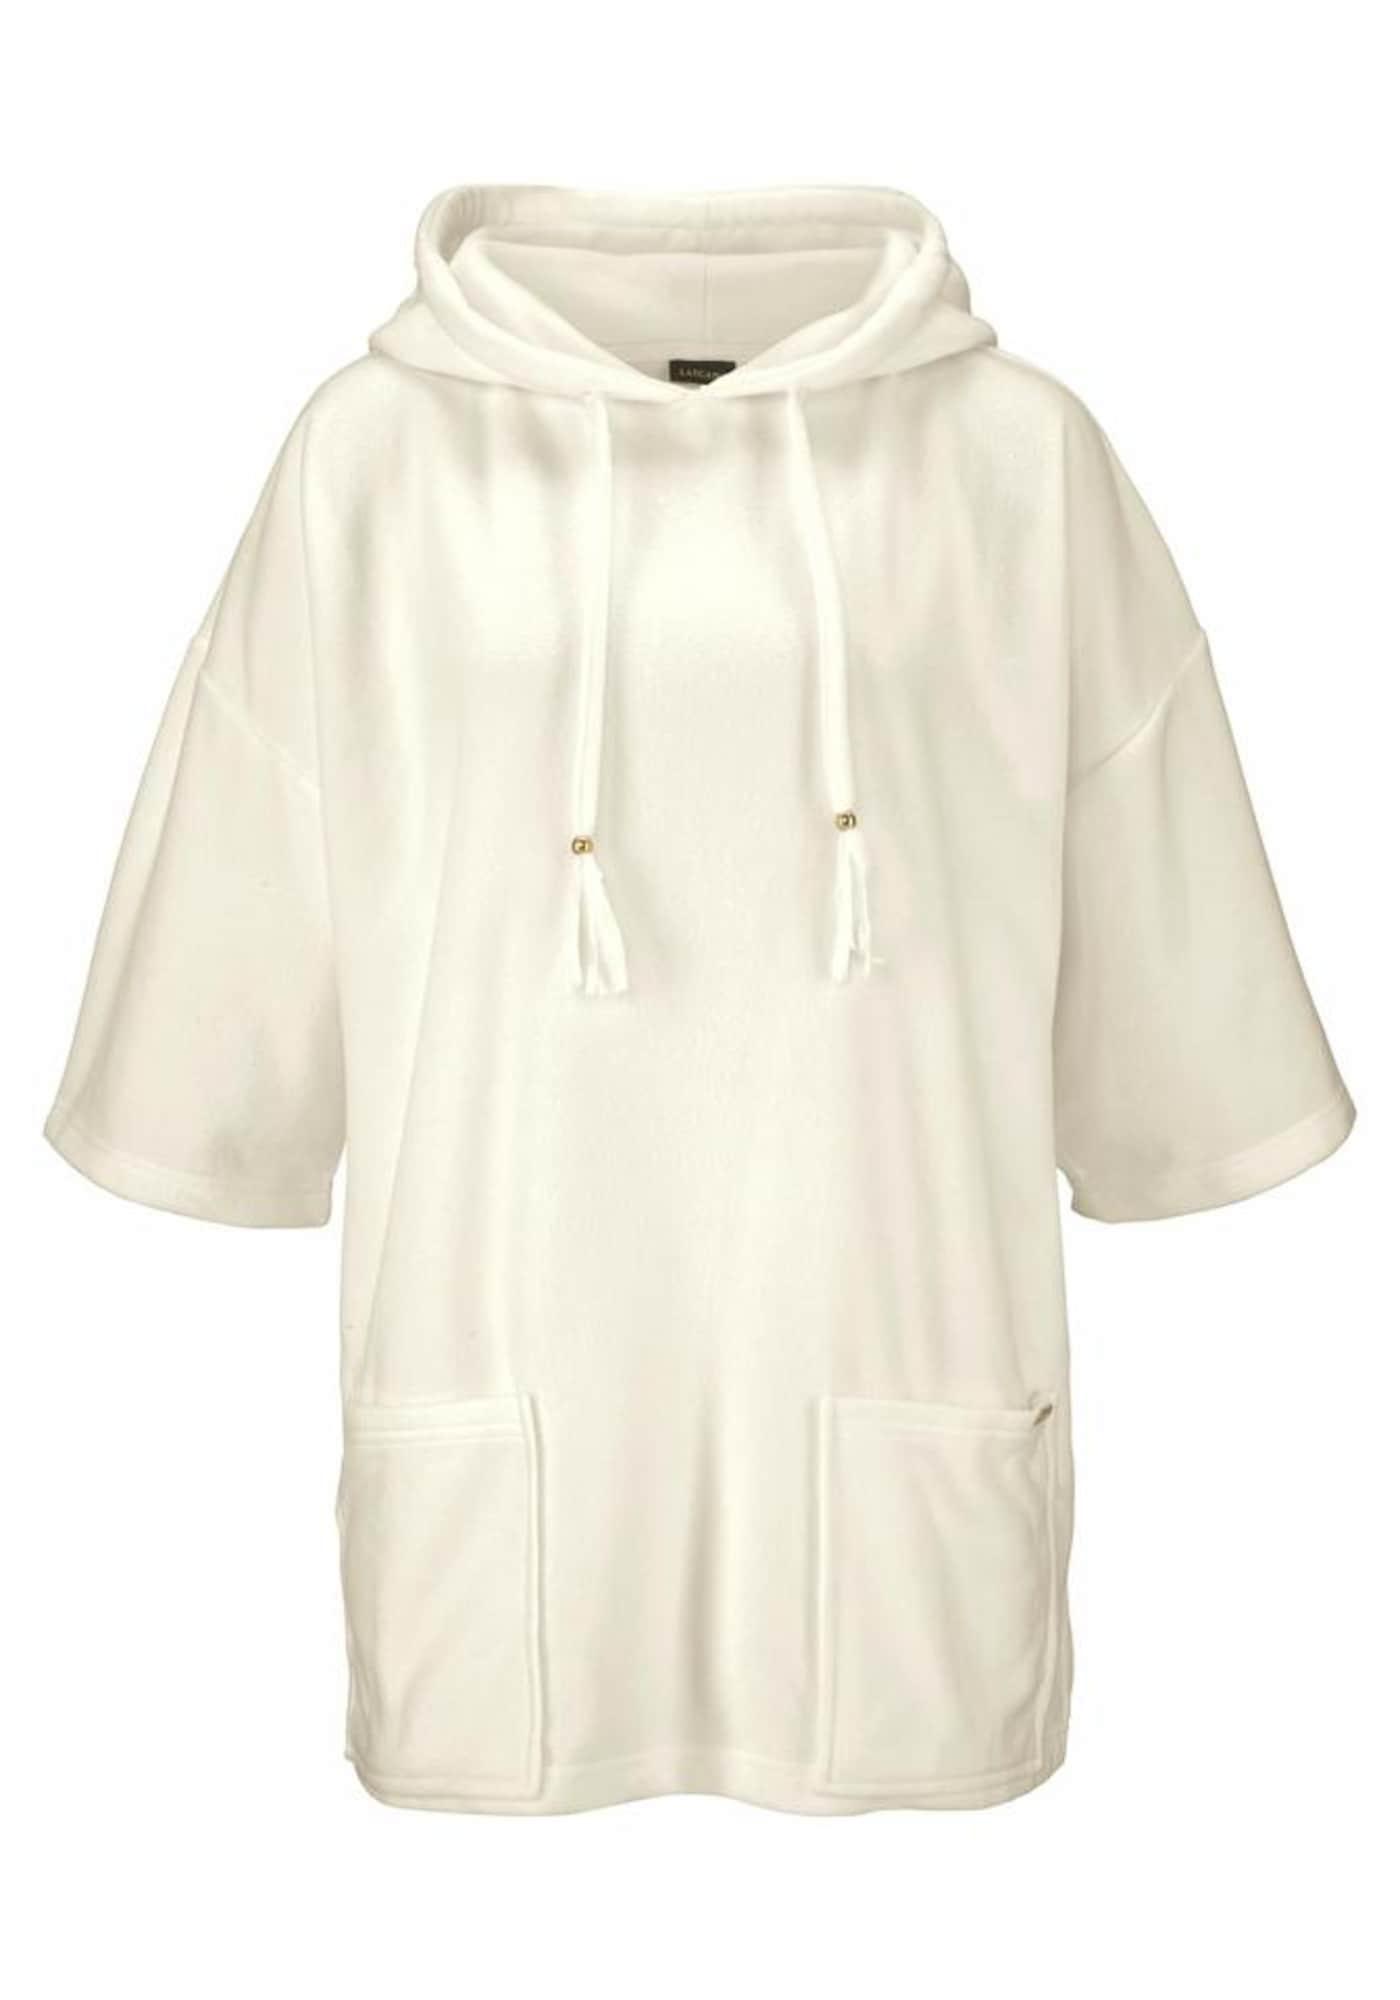 LASCANA Poncho | Bekleidung > Pullover > Ponchos & Capes | Lascana